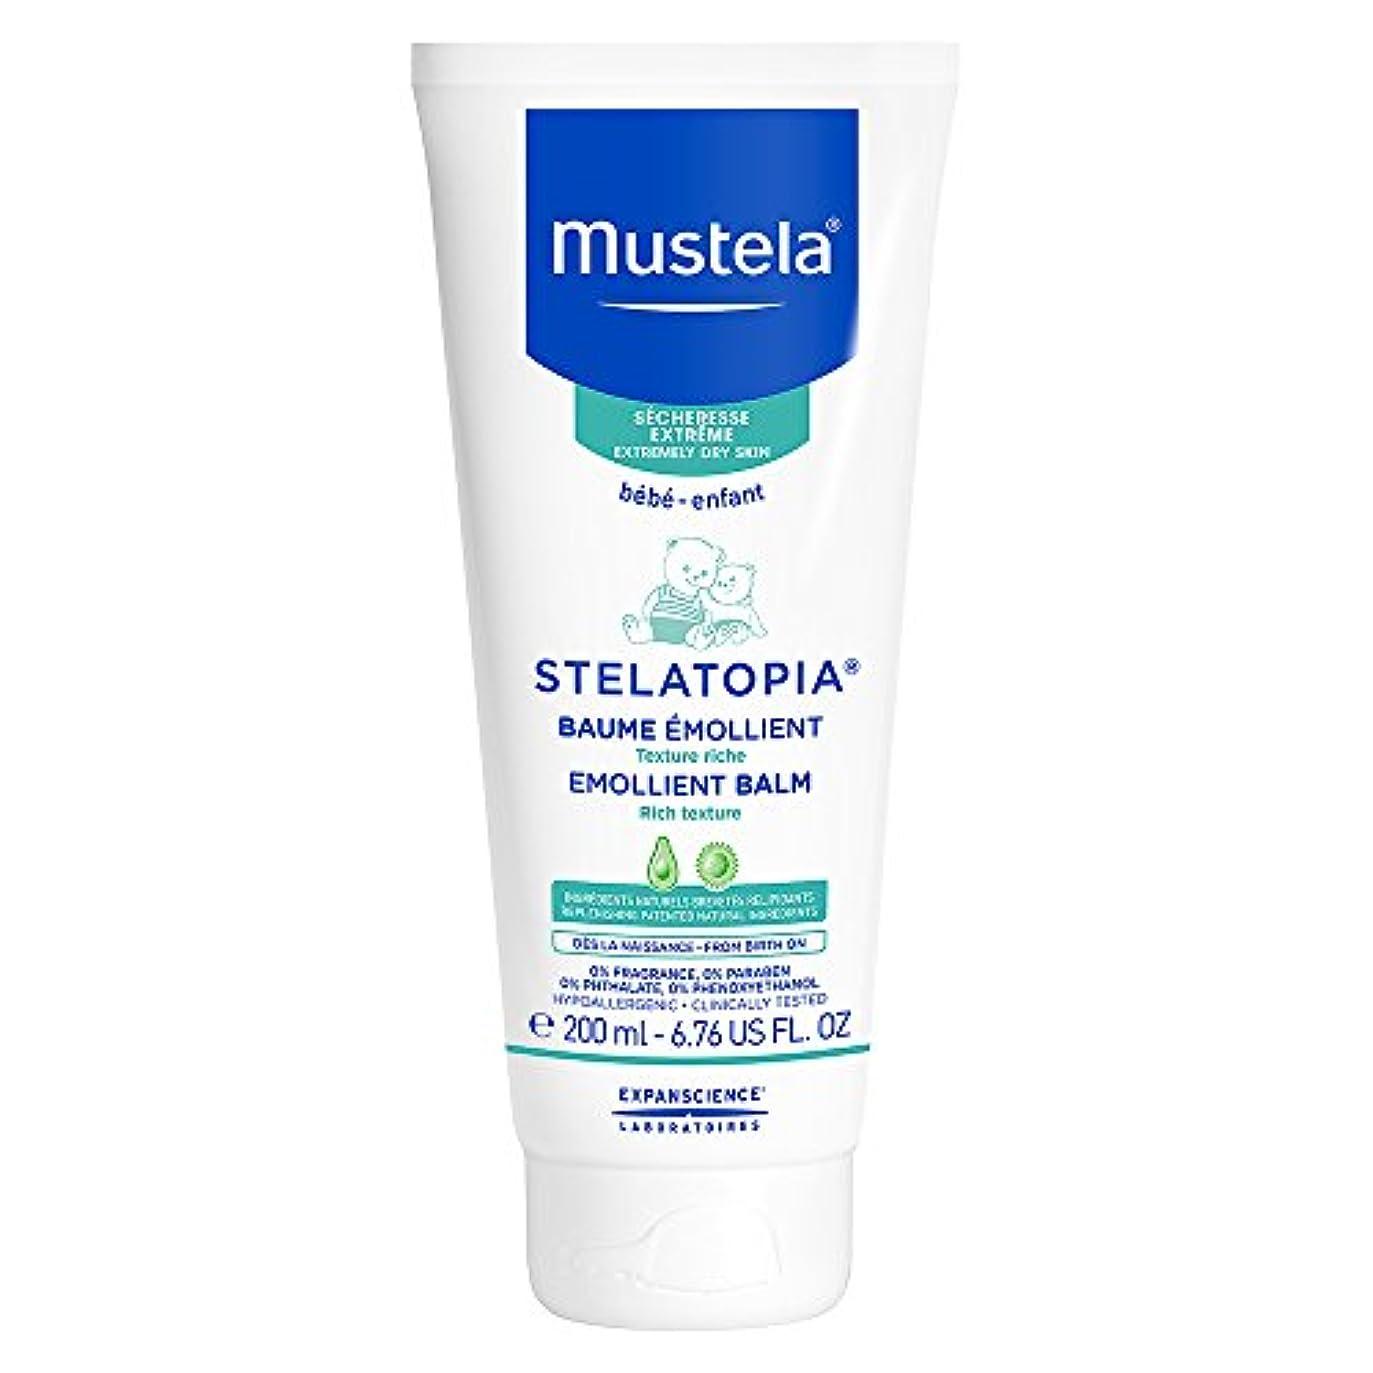 共産主義者十分な防止Mustela - Stelatopia Emollient Balm (6.76 oz.)